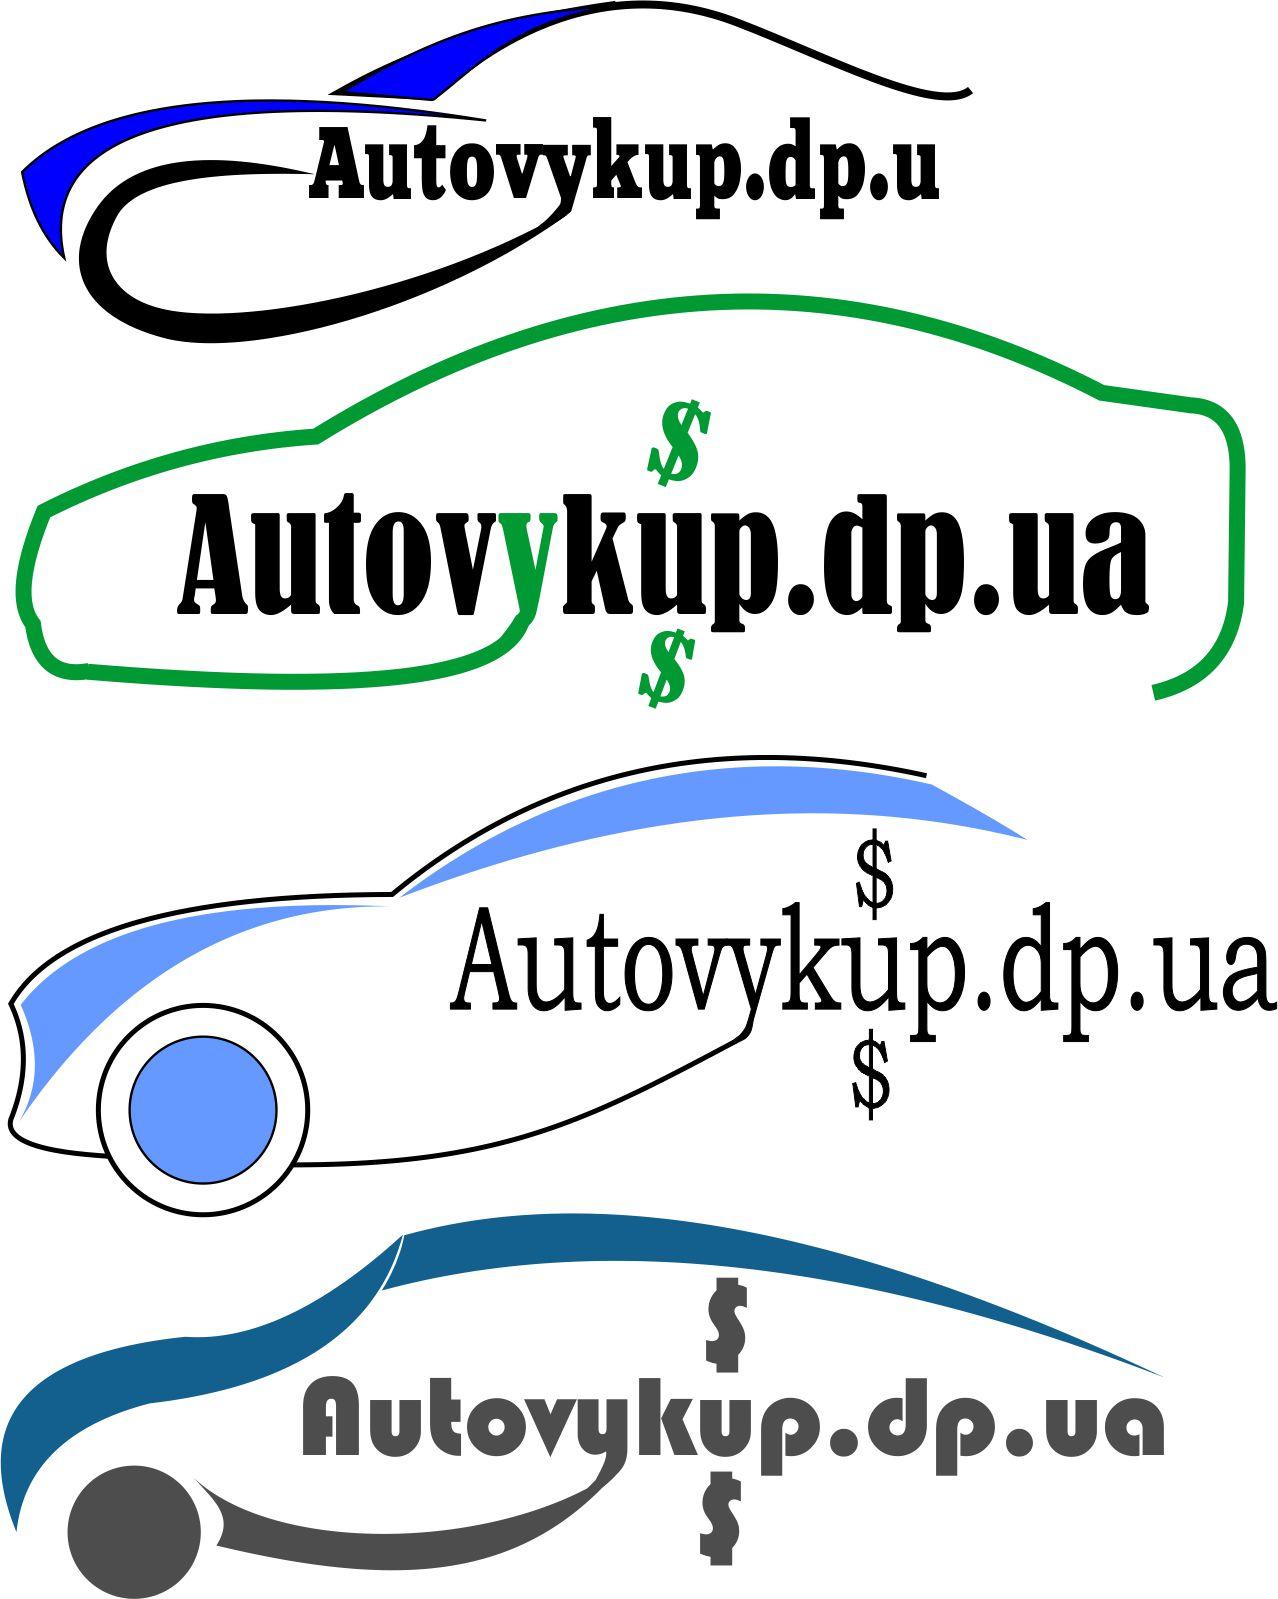 Фото Варианты логотипов